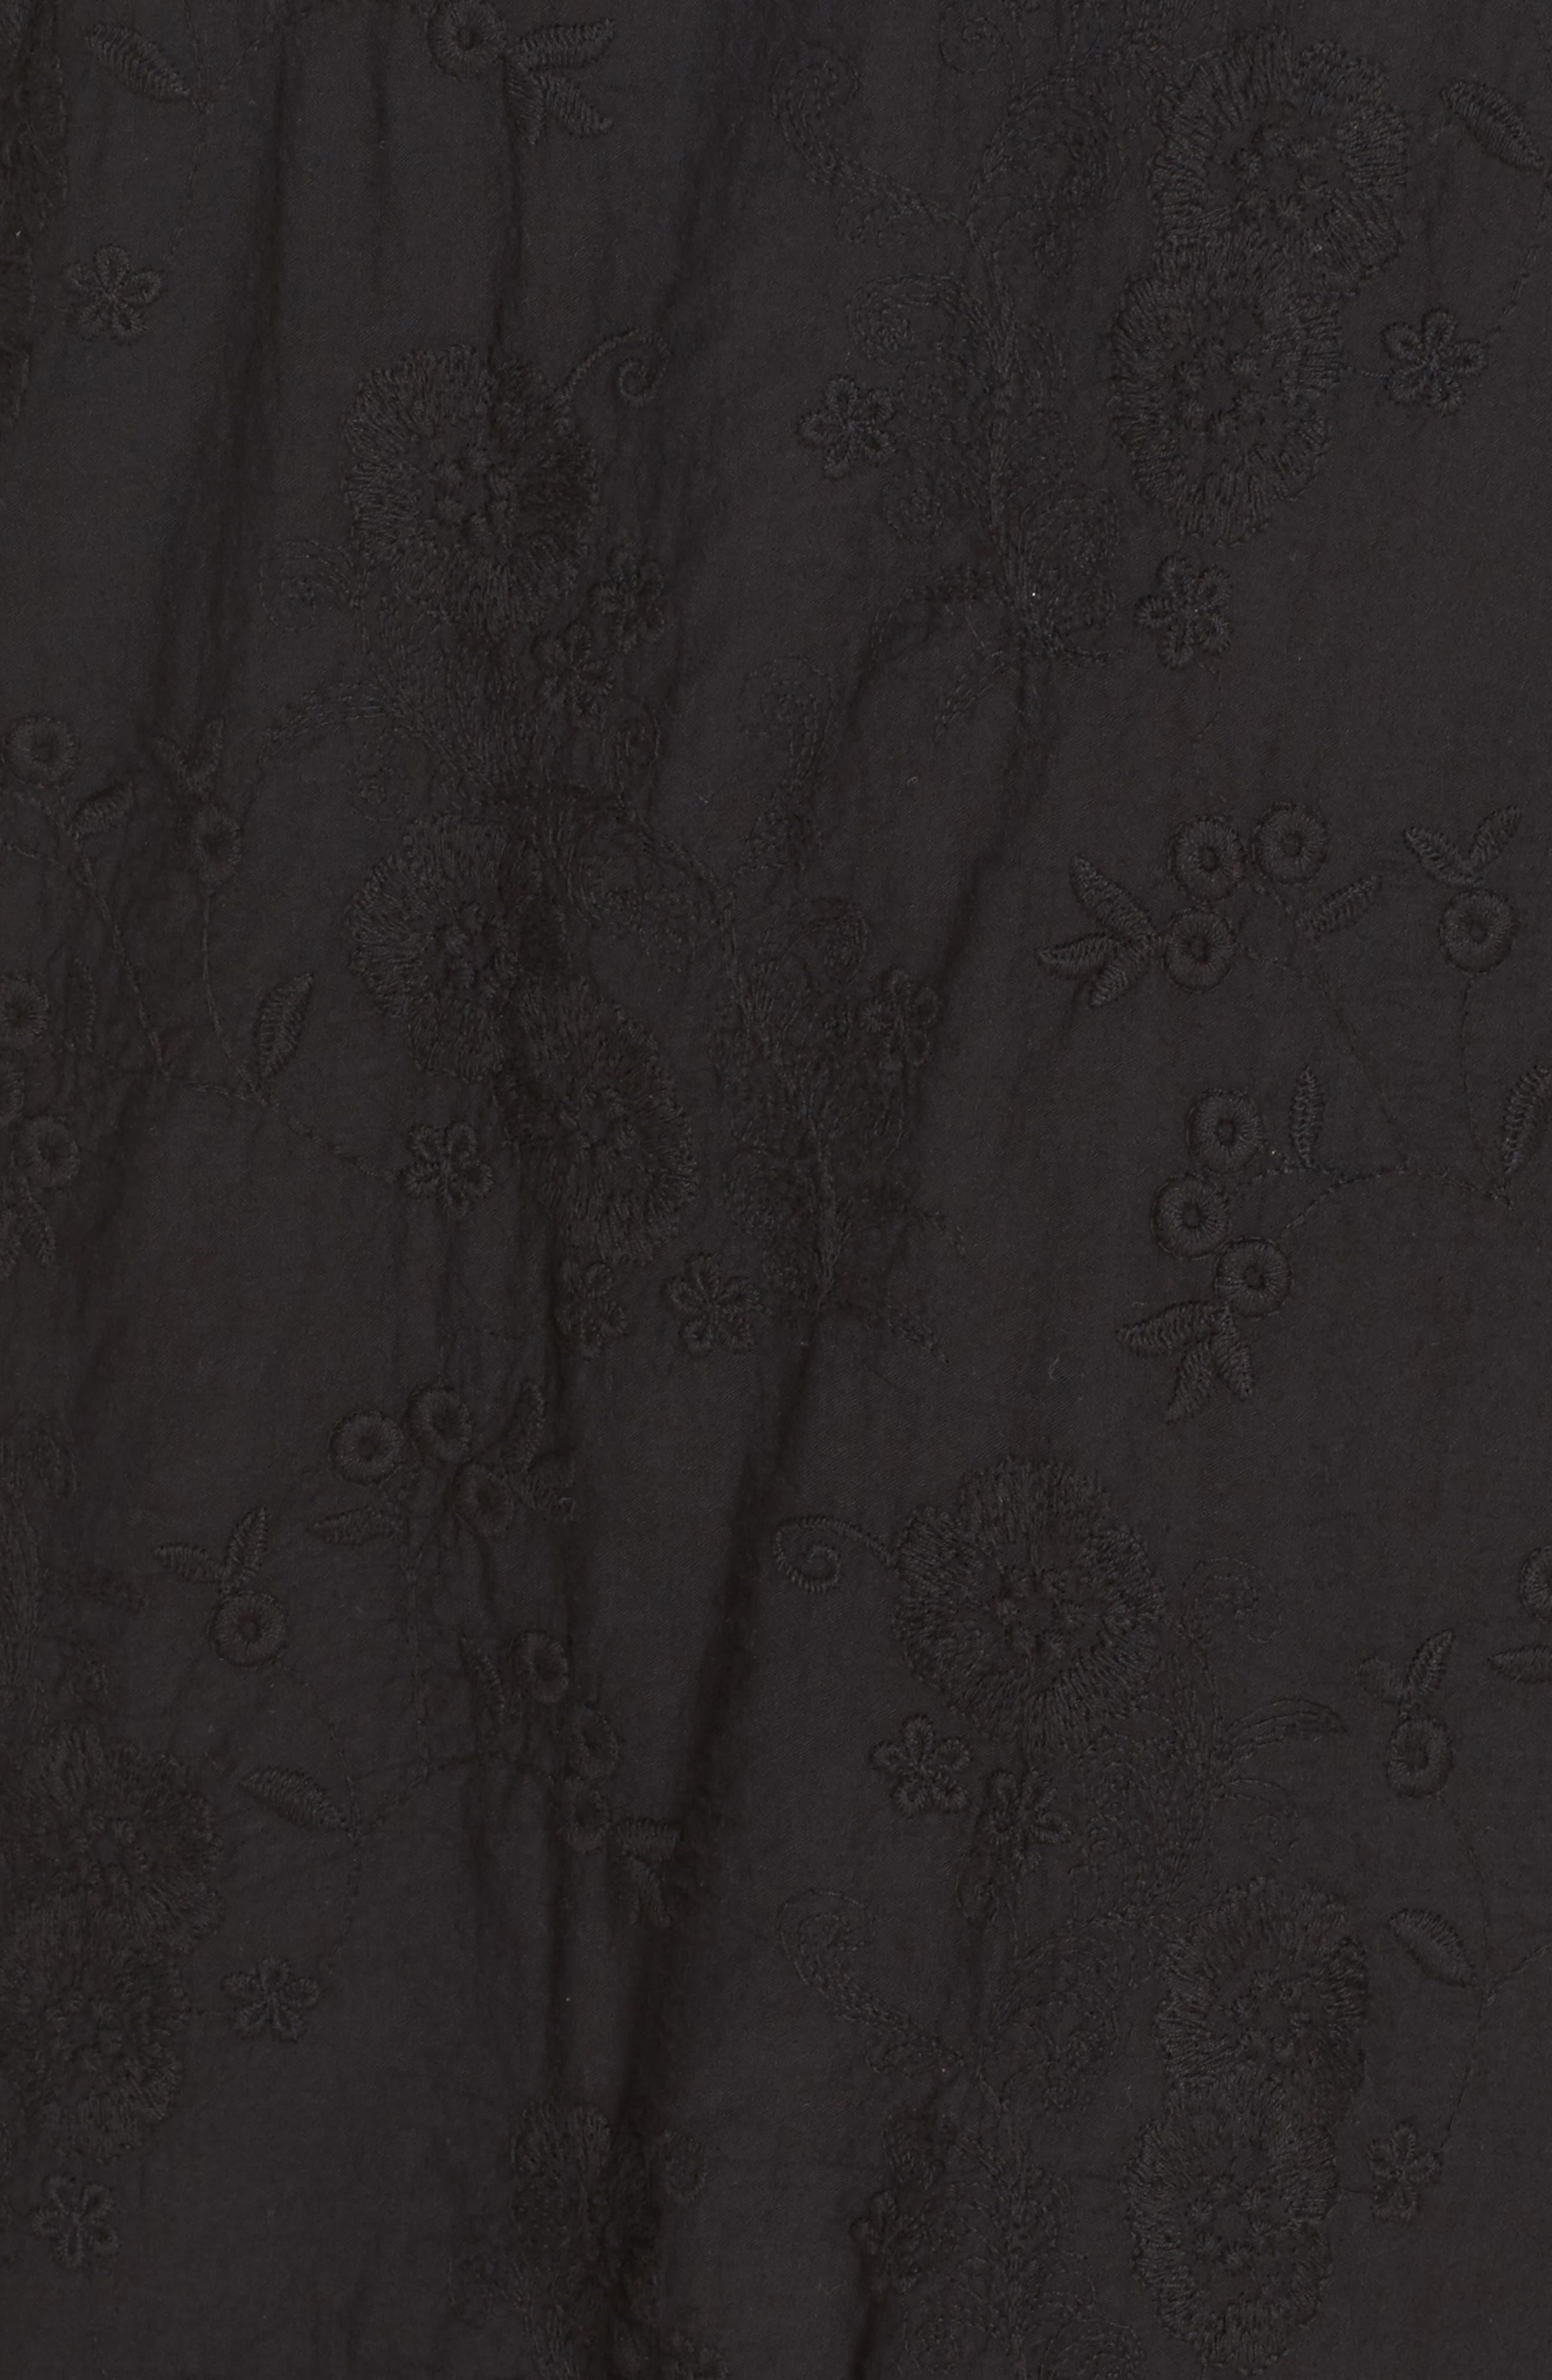 Zen Garden Cover-Up Dress,                             Alternate thumbnail 5, color,                             001